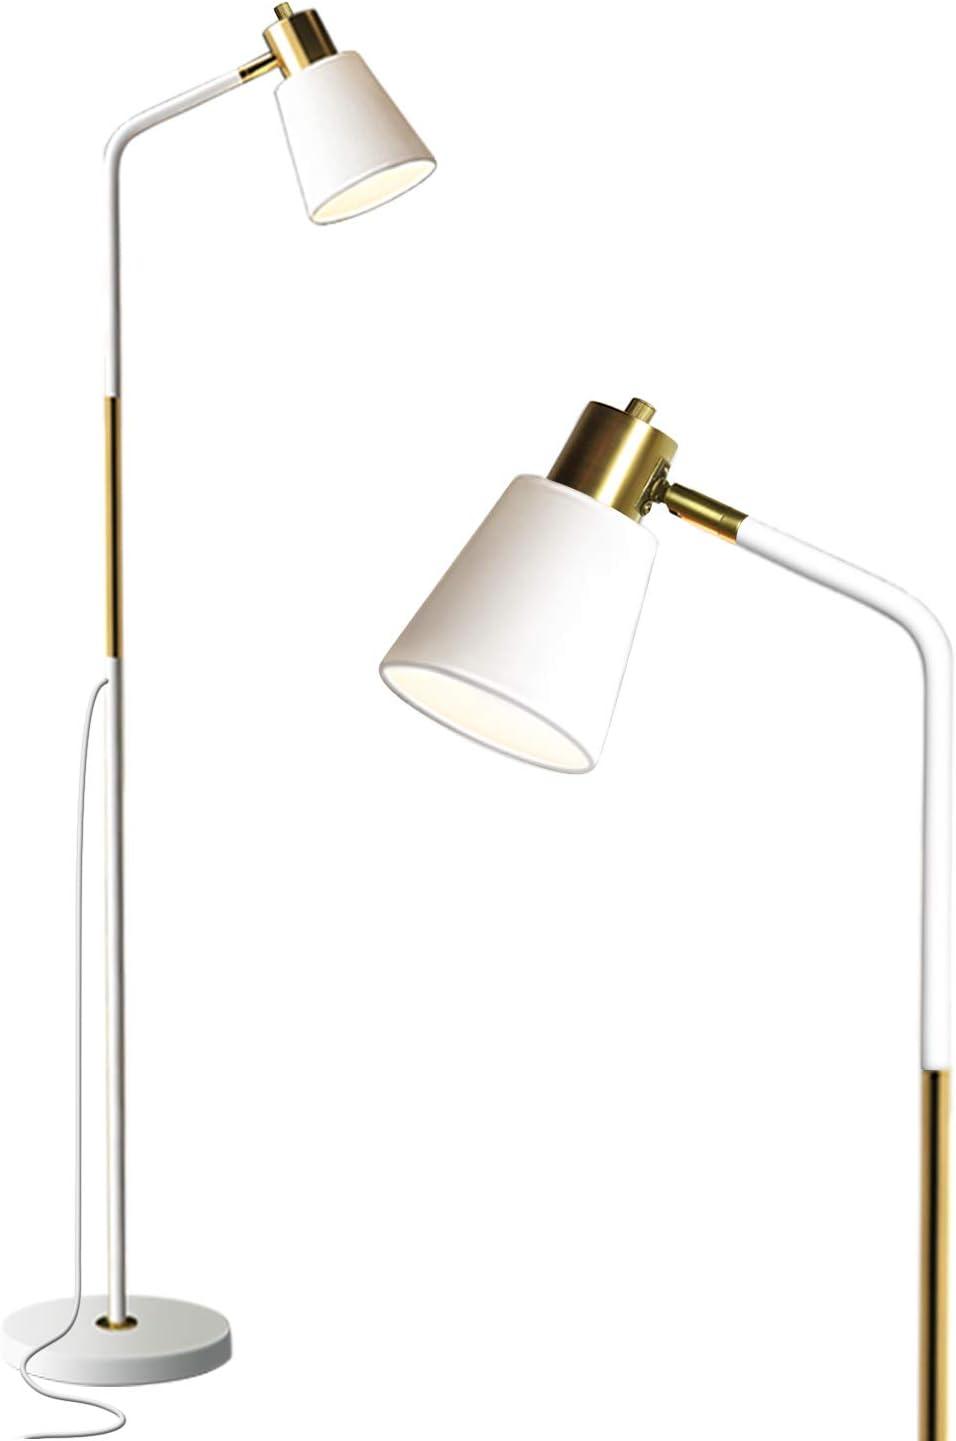 Floor Max 47% OFF Lamp Industrial Lamps for Bedrooms Living Ranking TOP20 Rooms -